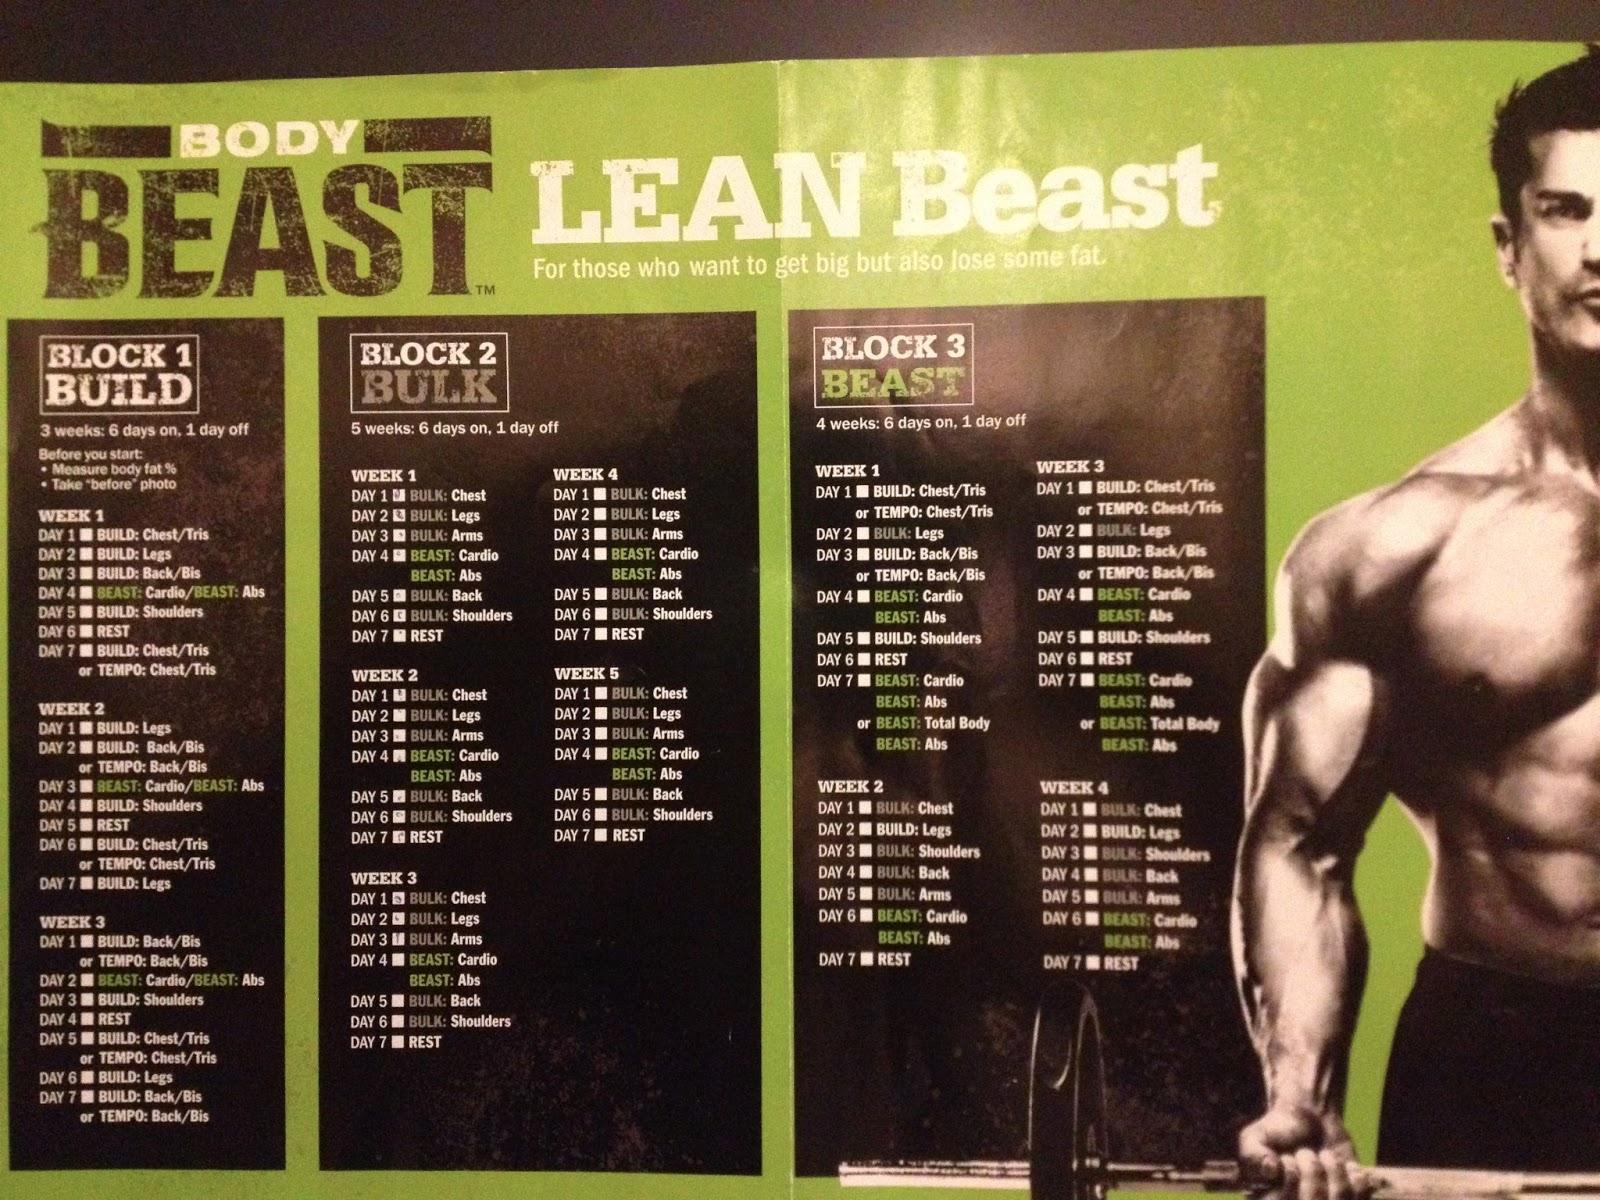 Week 1 Body Beastt25 Hybrid And Meal Plan | Melanie Mitro within Body Beast Hybrid Calendar